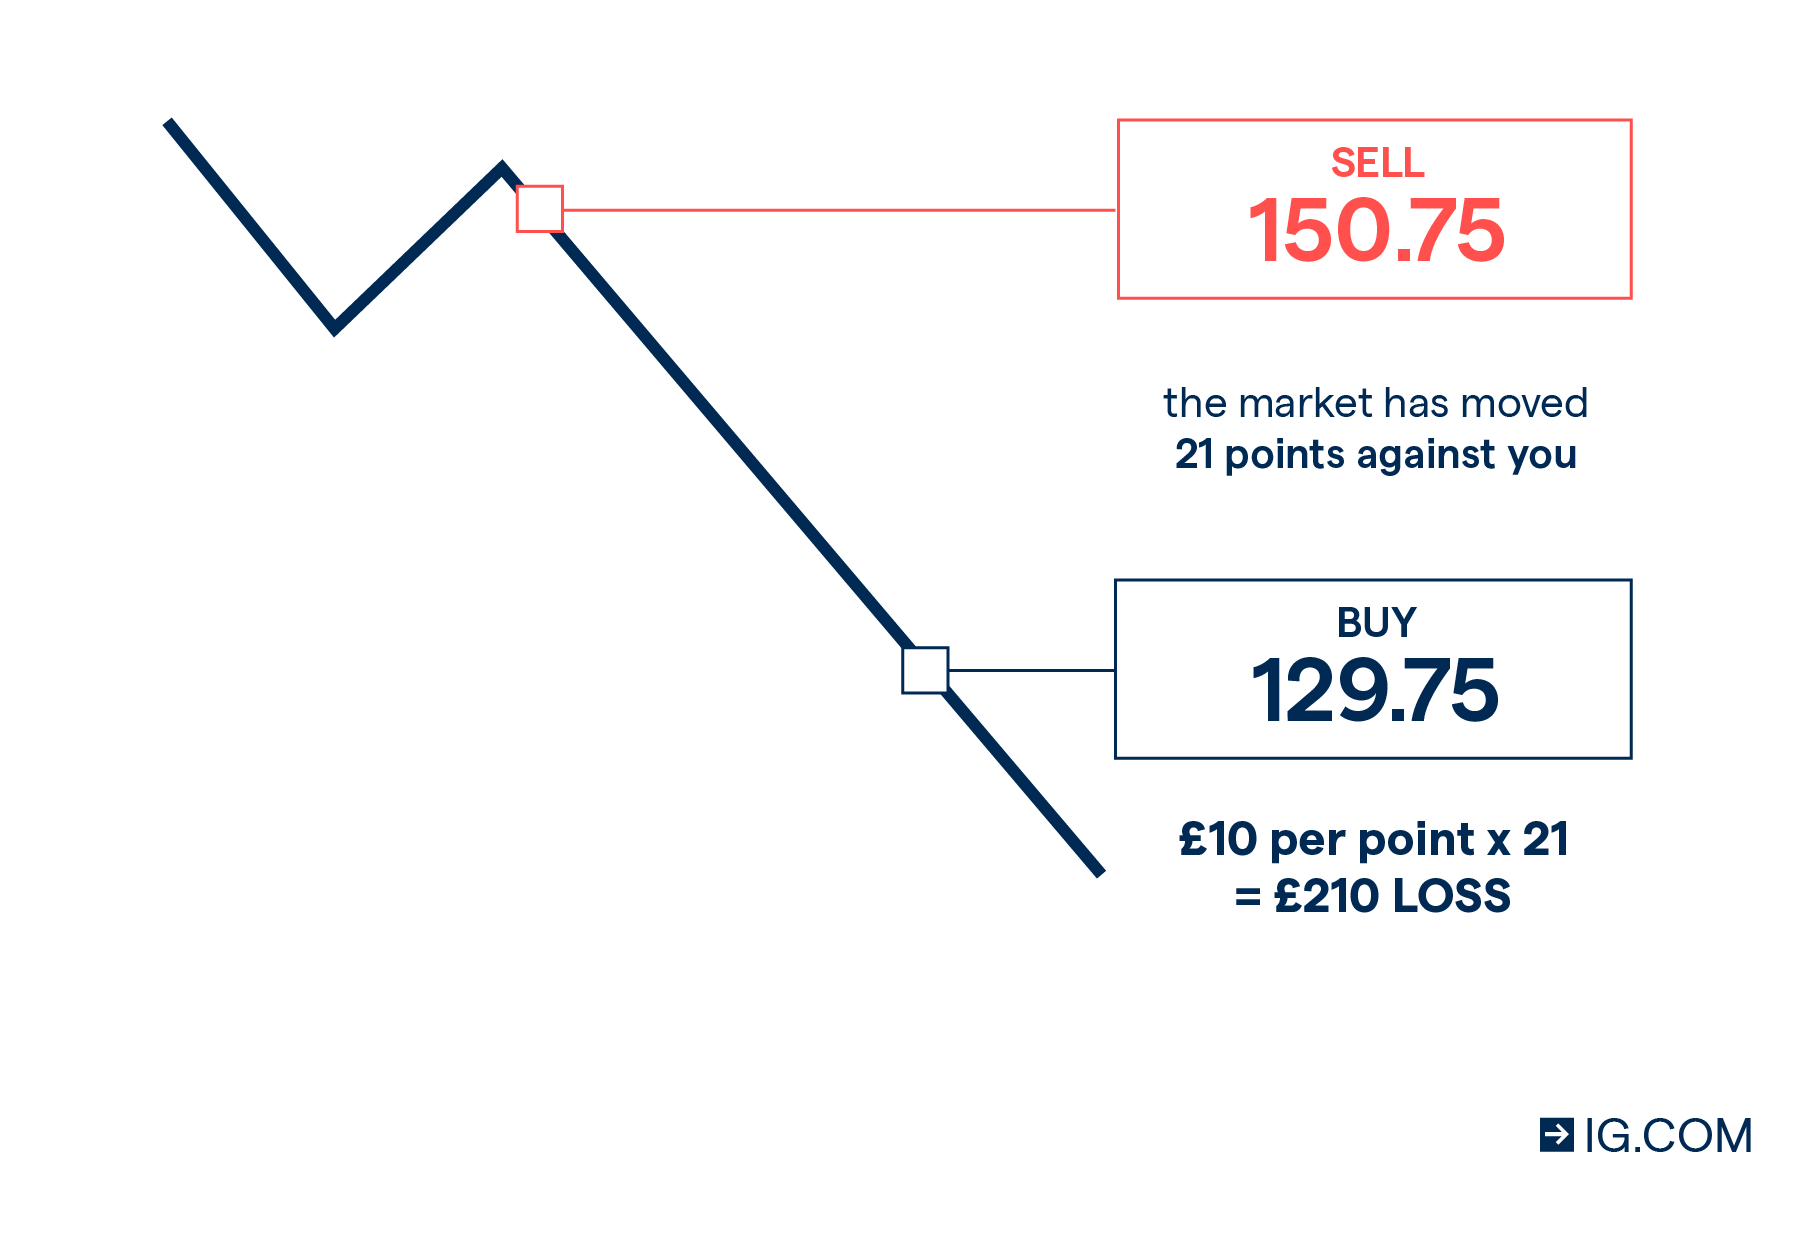 ig index spread betting tutorial photoshop